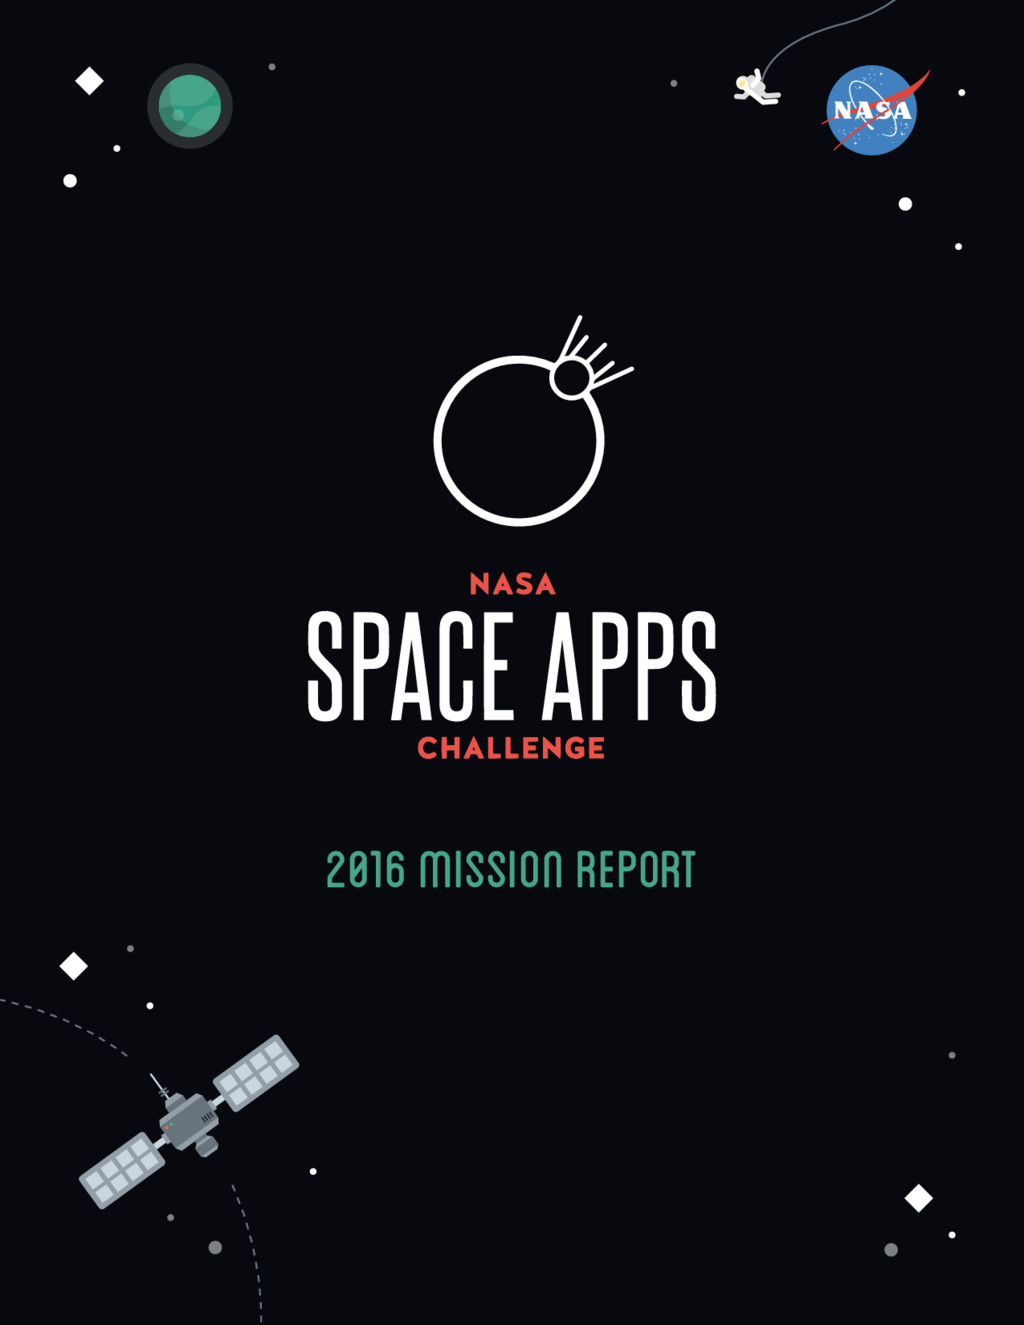 2016 MISSION REPORT